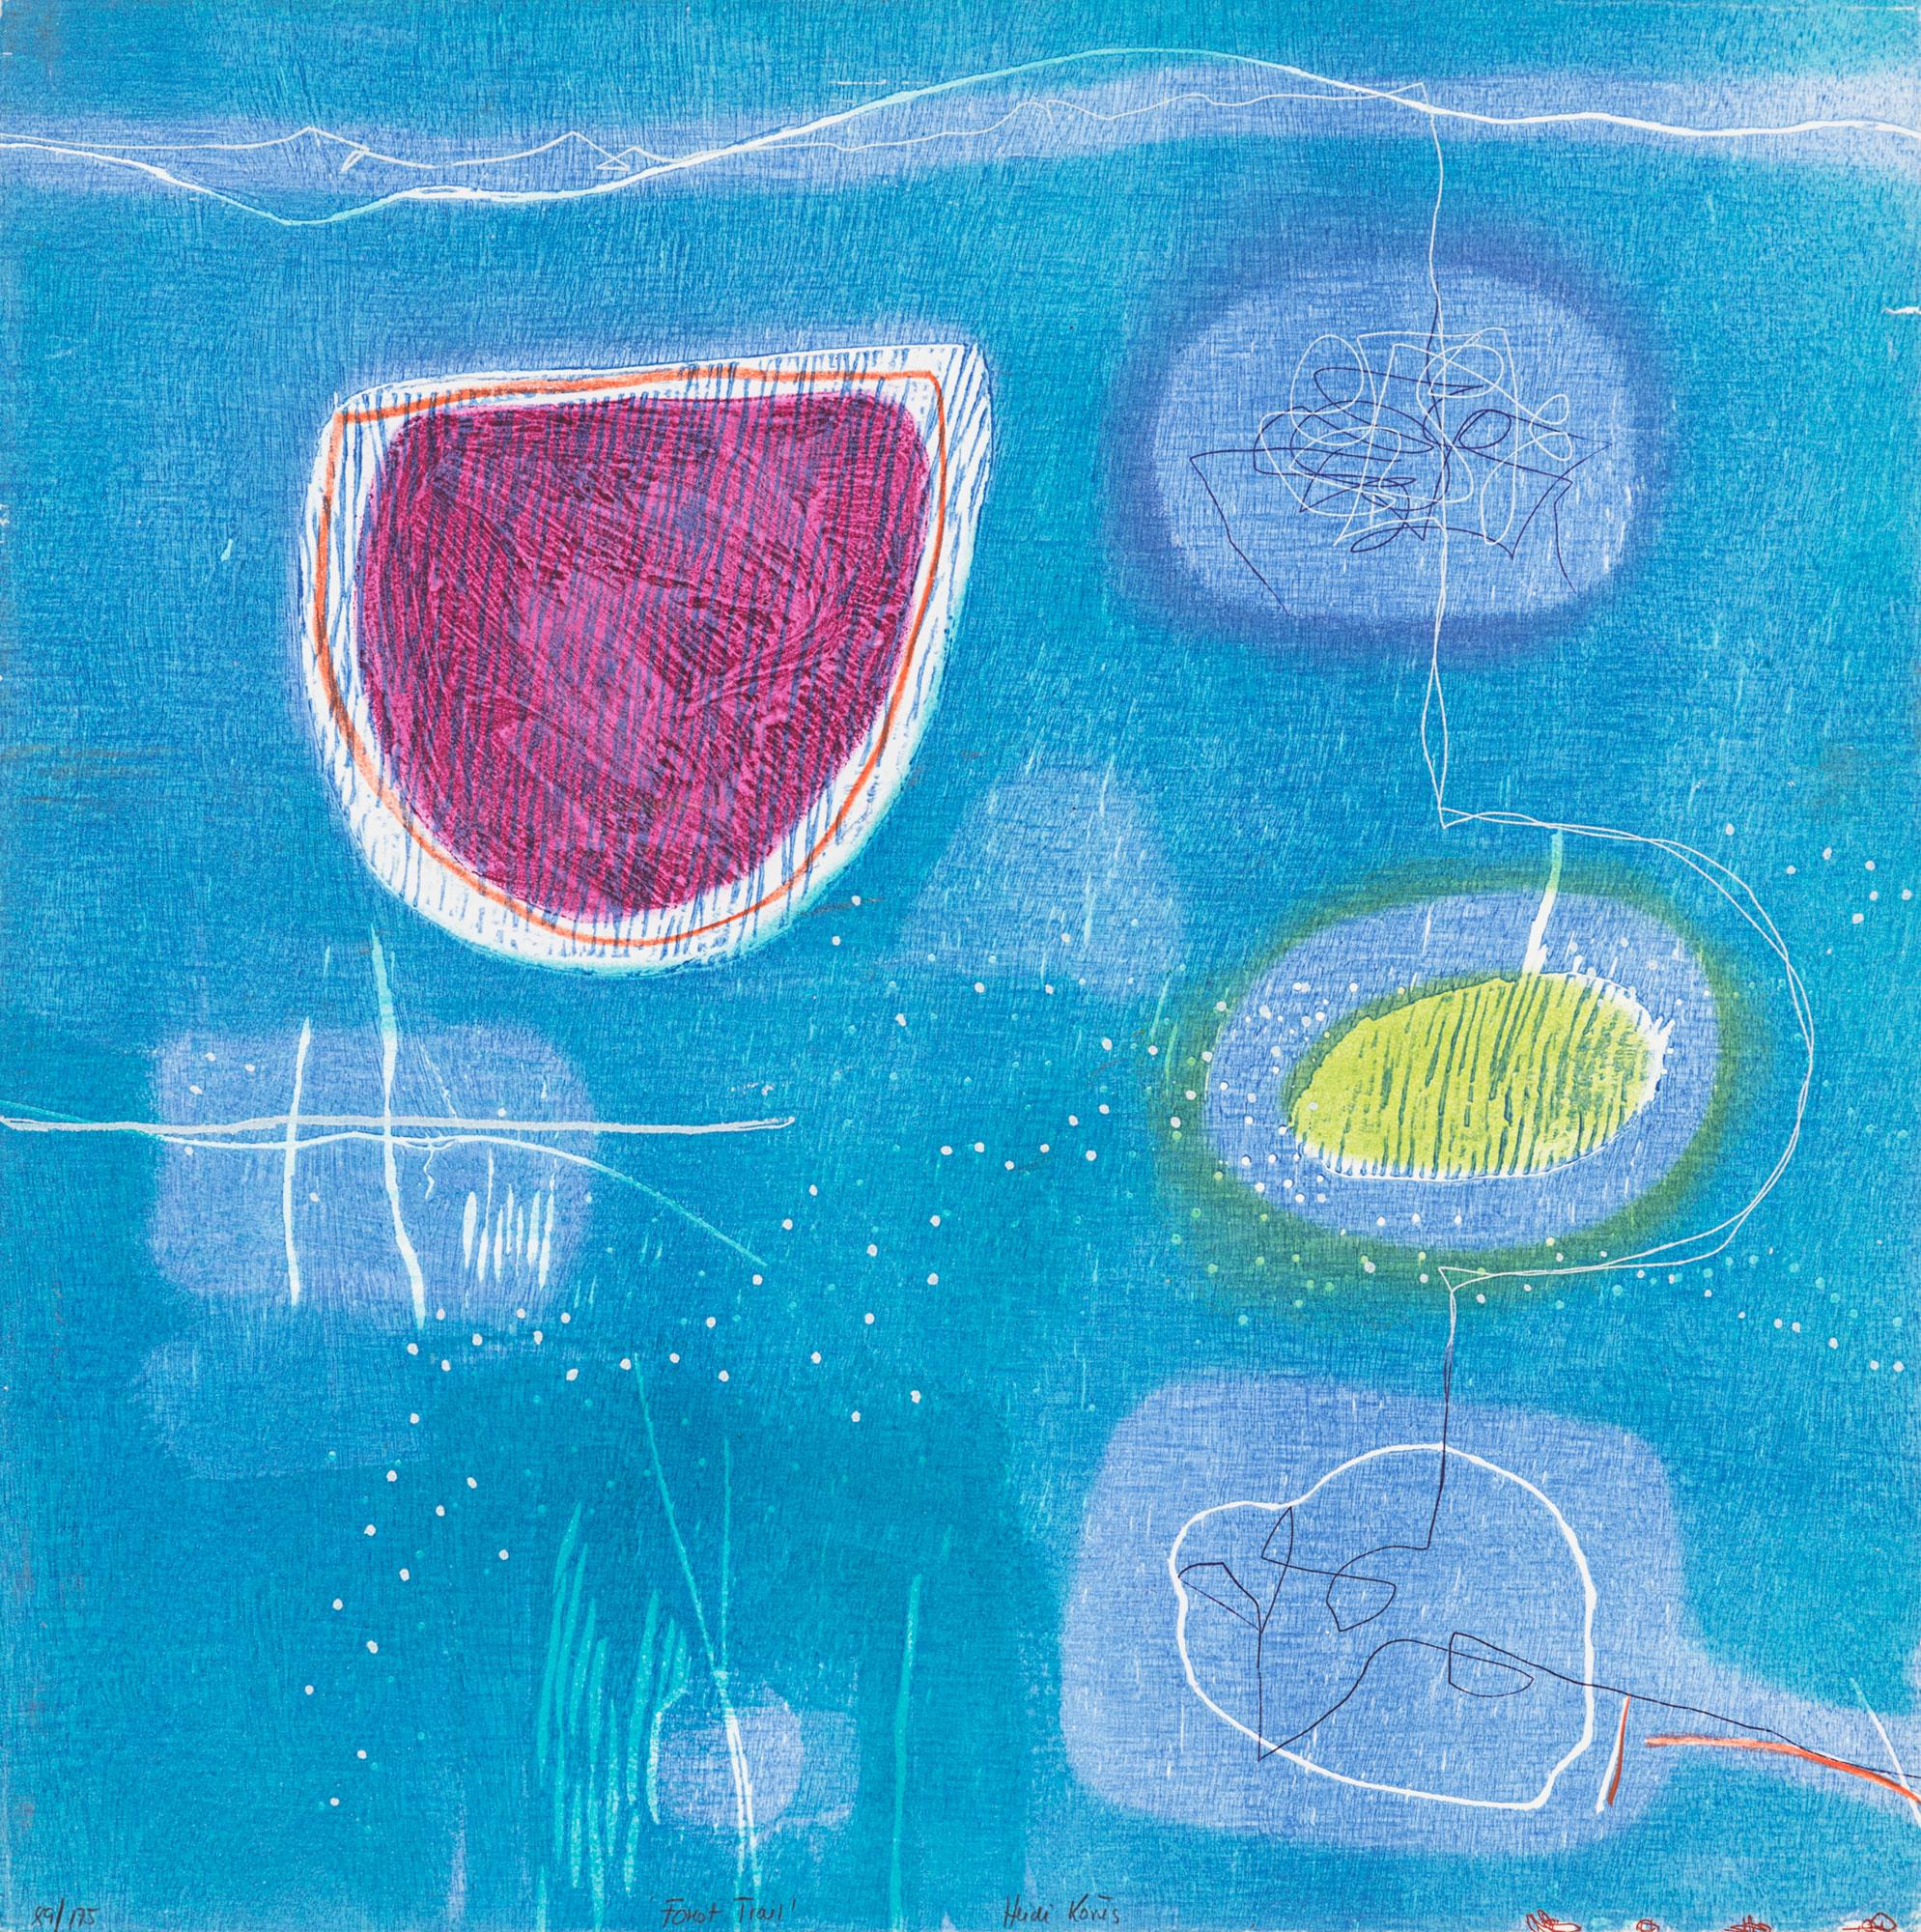 H. Konig, Blue Abstract